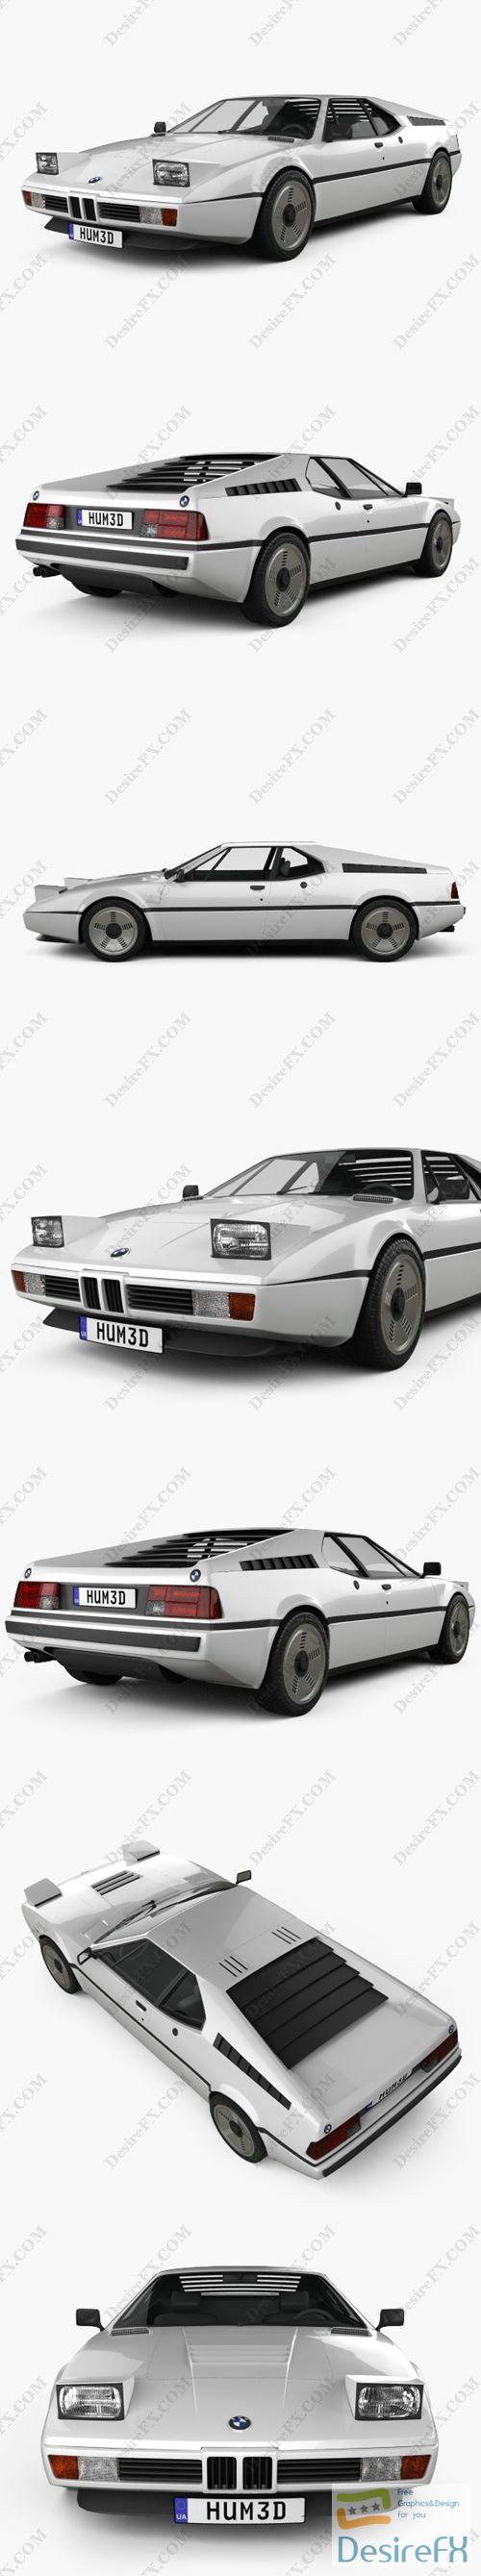 BMW M1 1978 3D Model